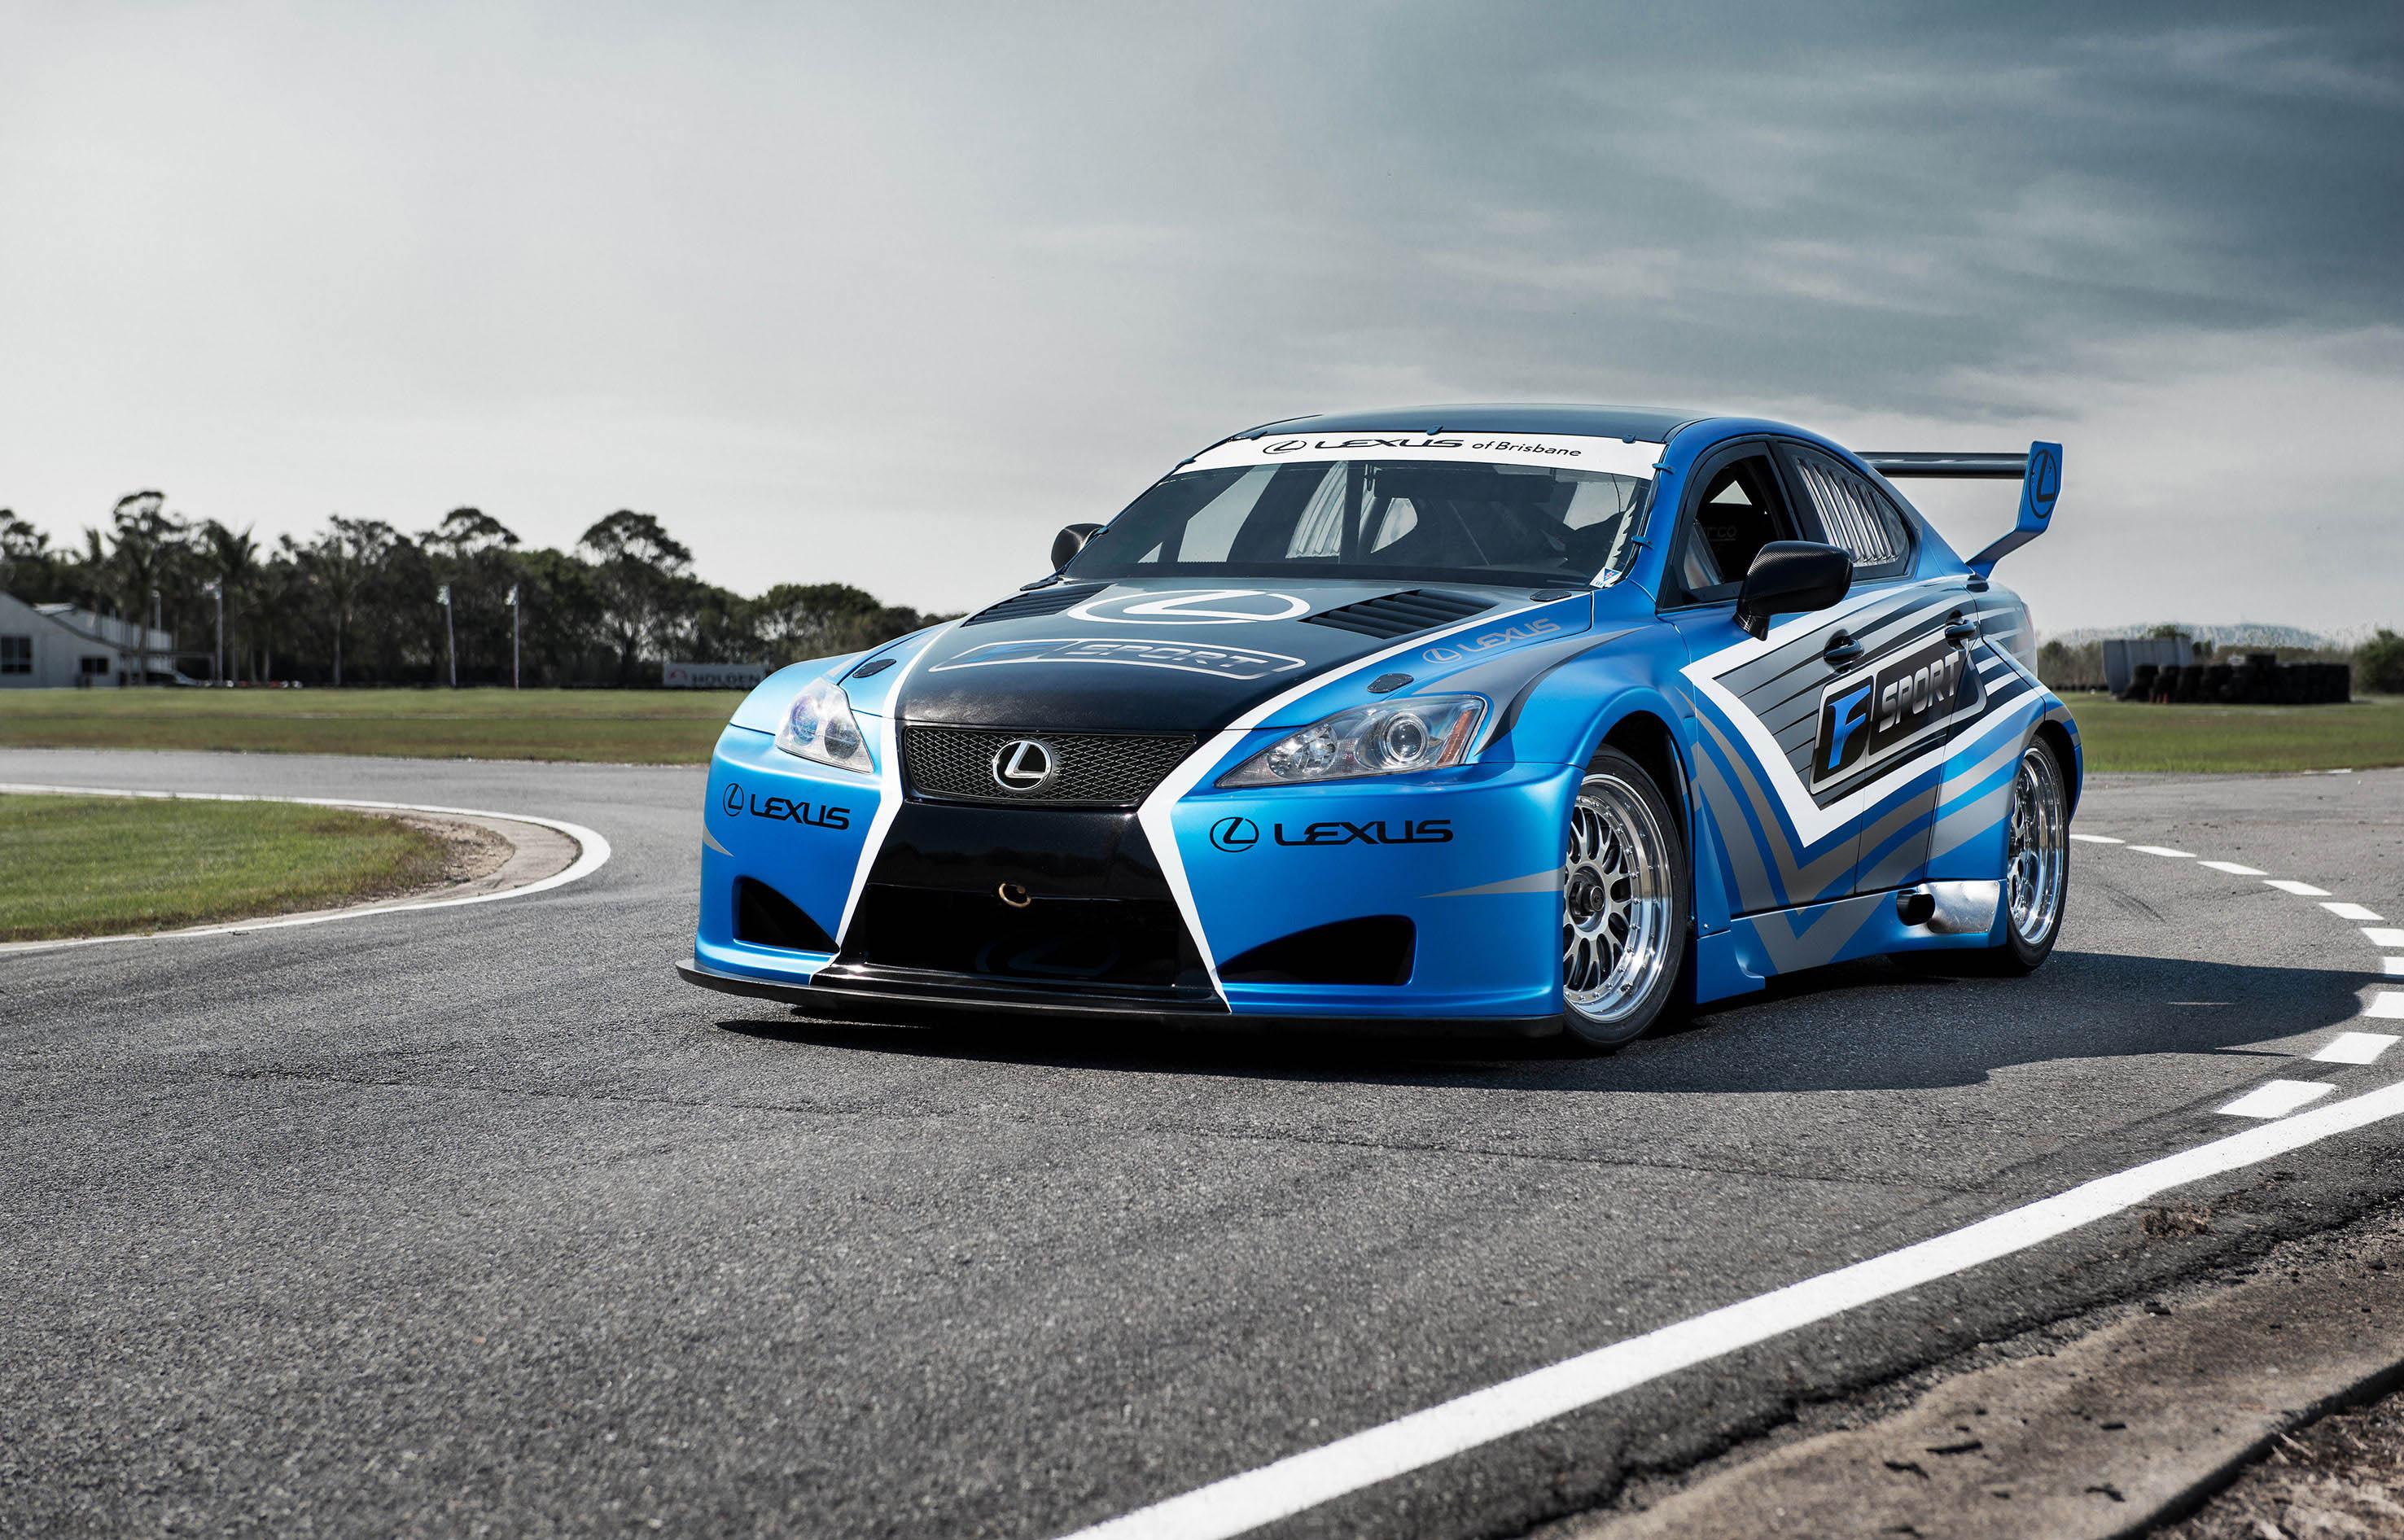 2013 Lexus IS-F Race Cars by Mauer Racing